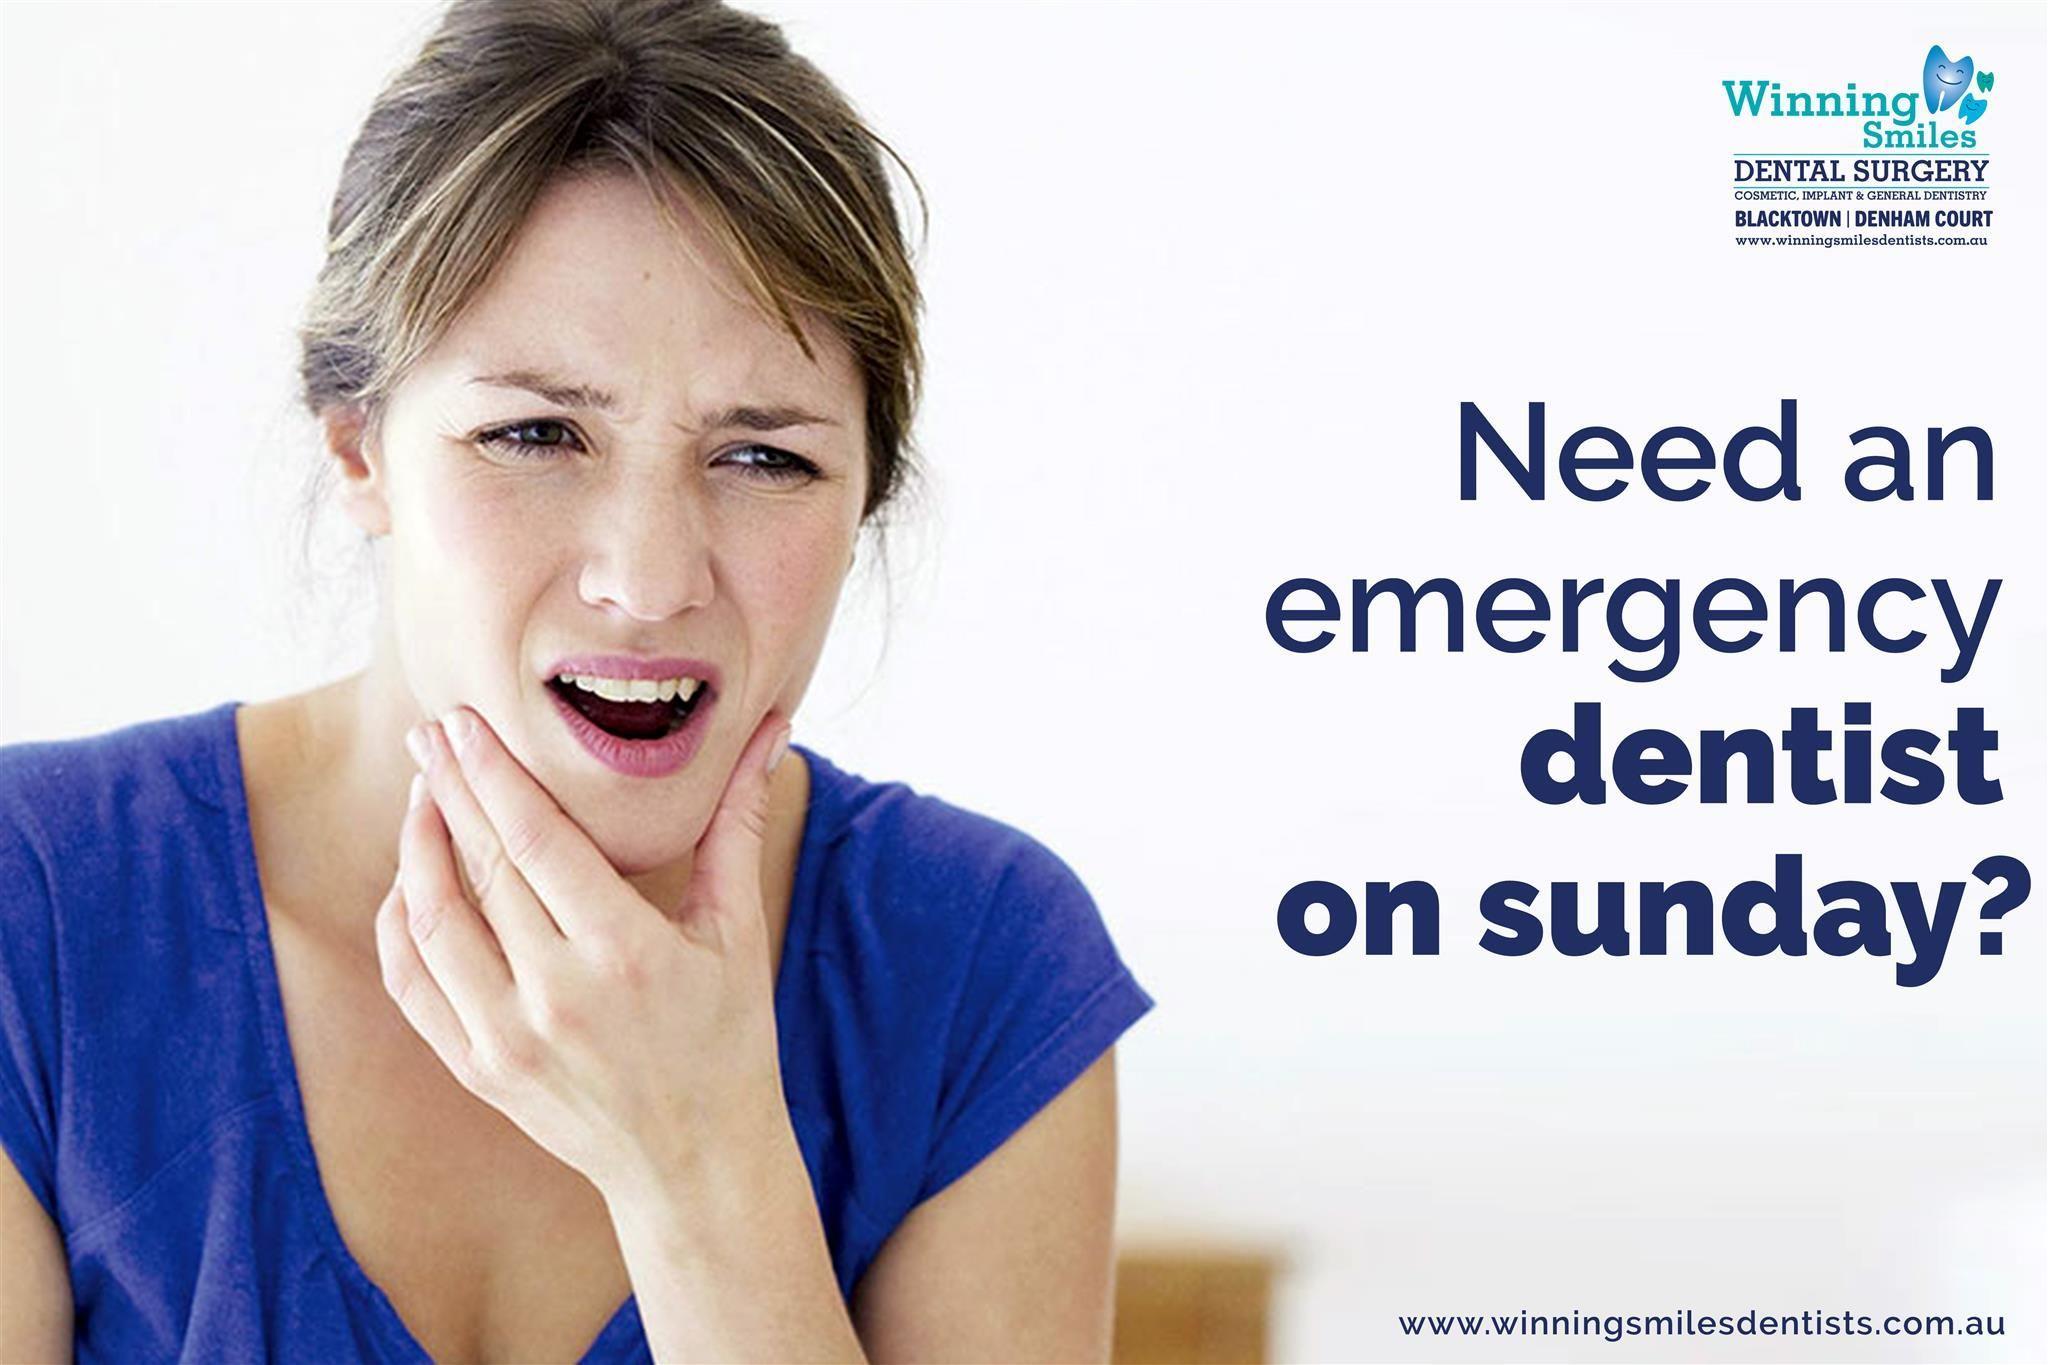 Alive Dental Surgery Orthodontics Oralcarerabbit Dentalbridgewatches Emergency Dentist Dentist